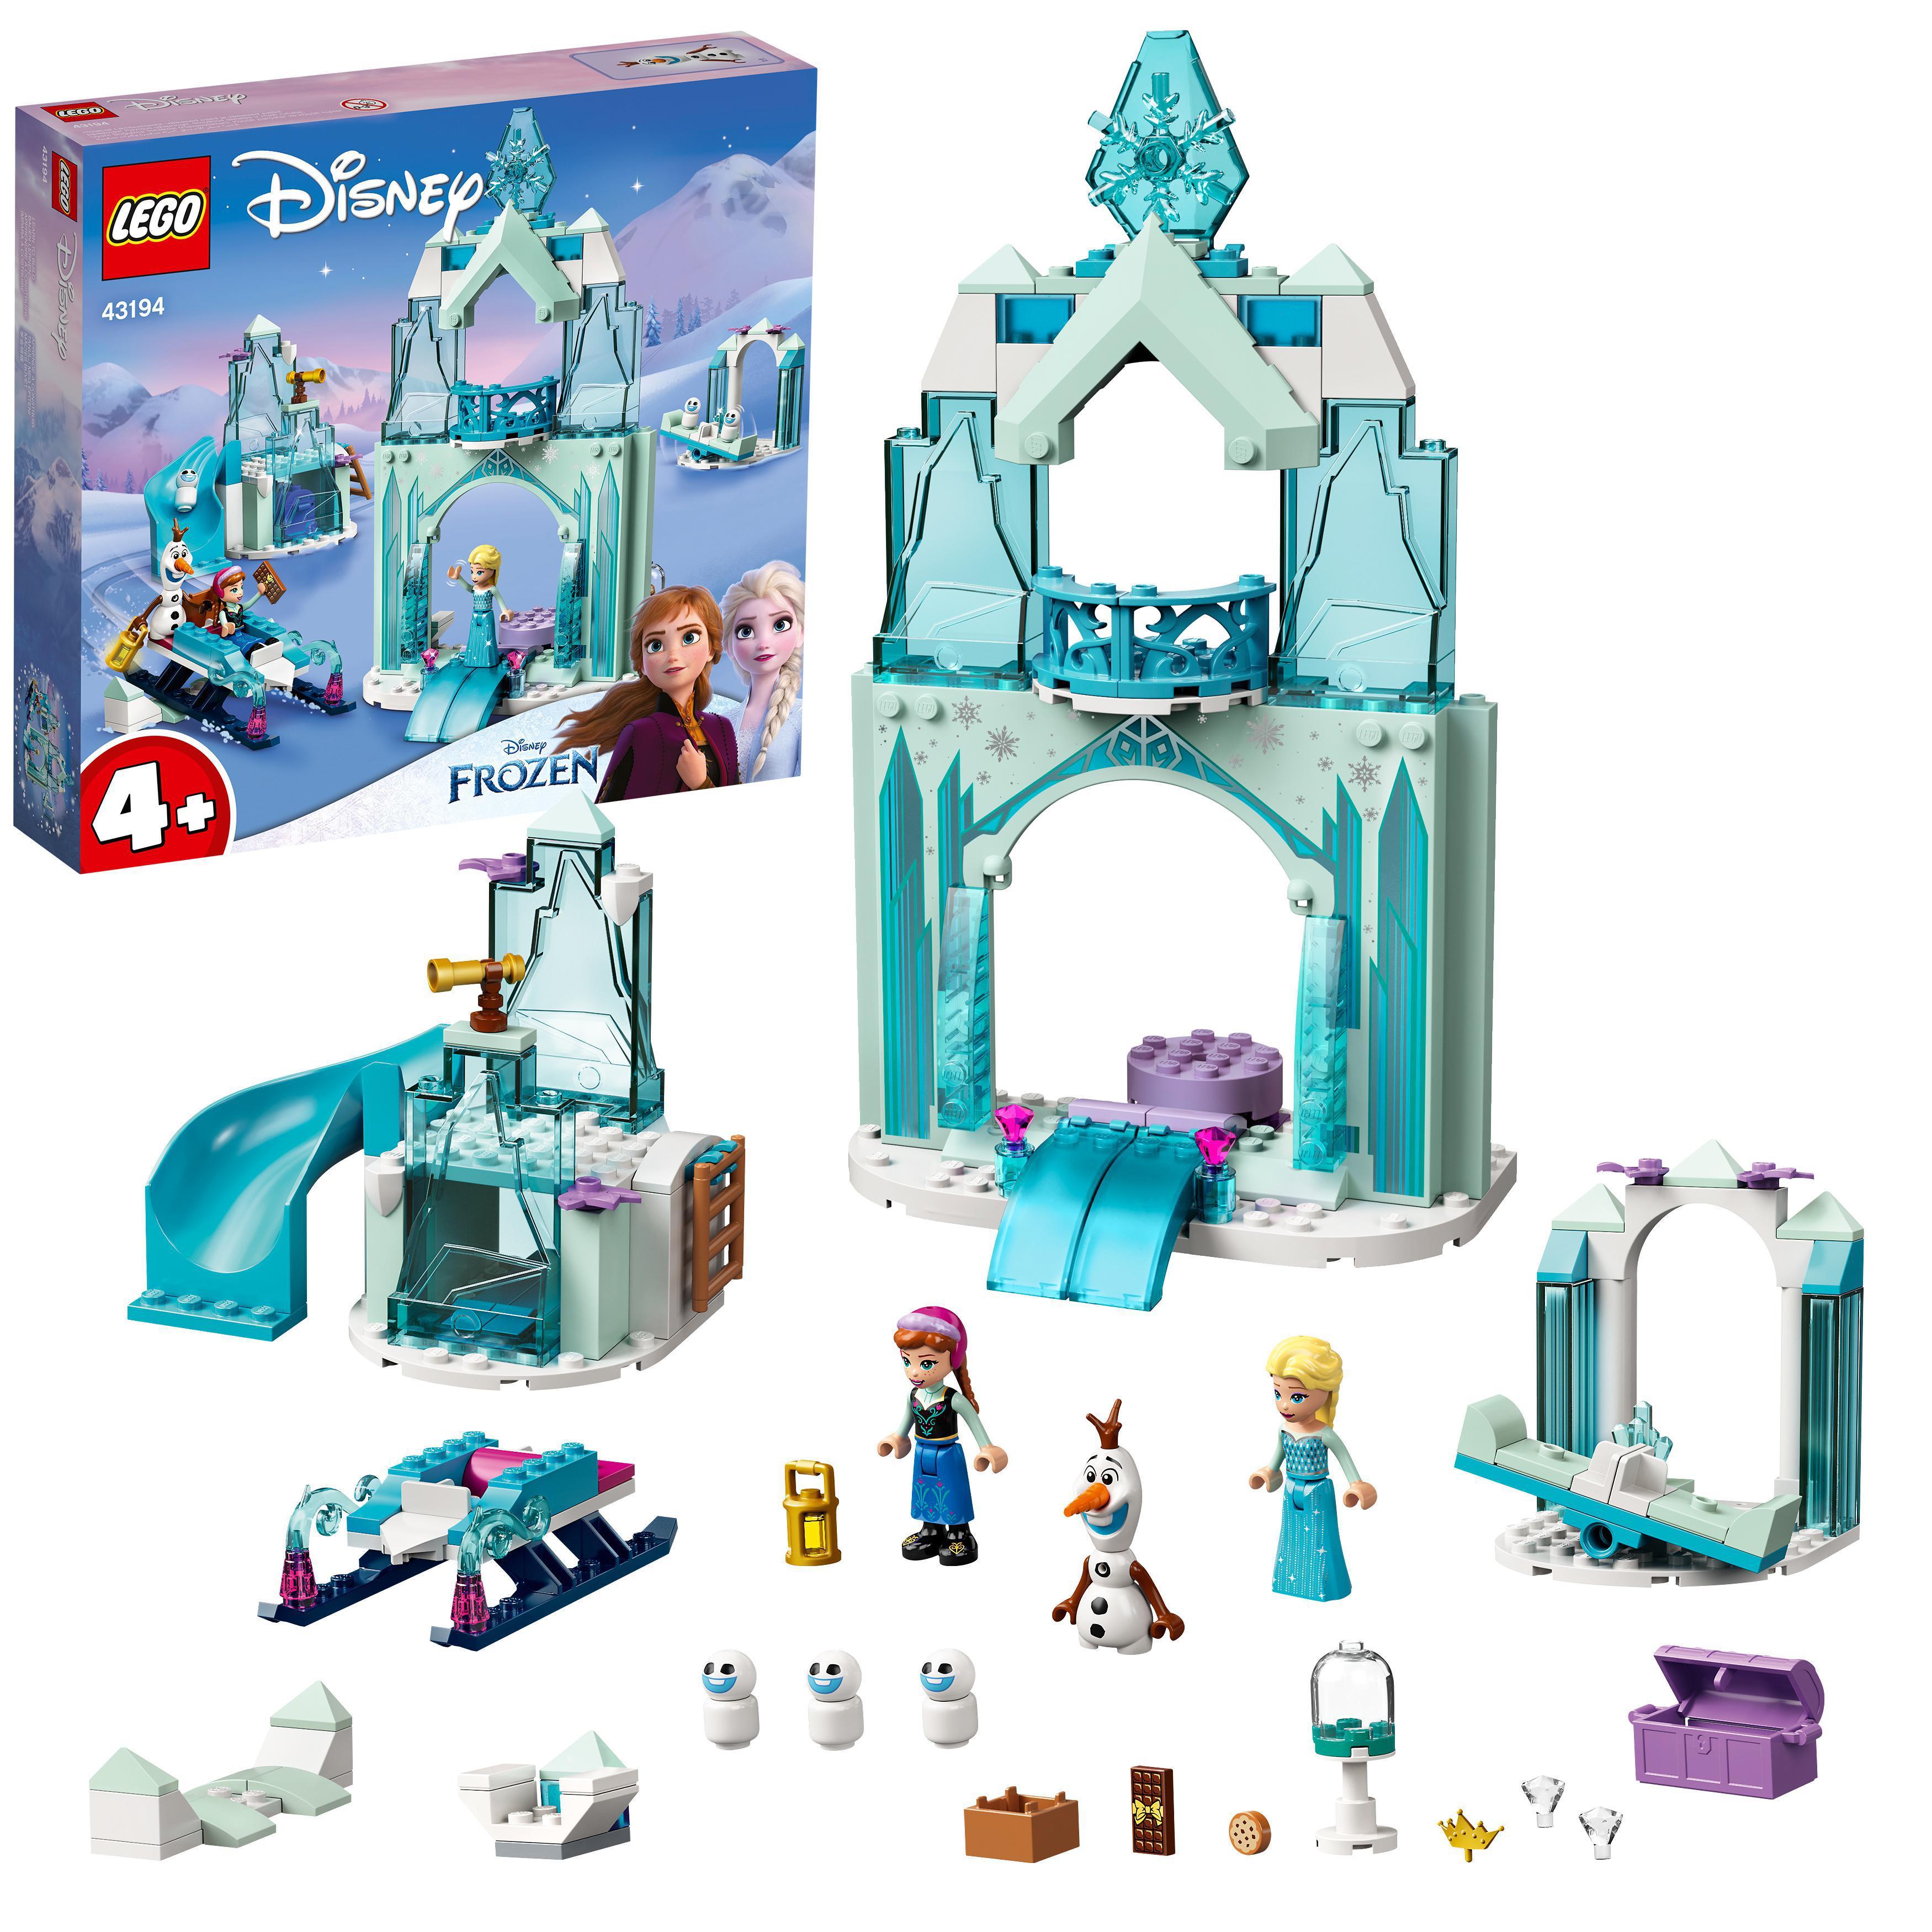 LEGO Disney Princess - Anna and Elsa's Frozen Wonderland (43194)